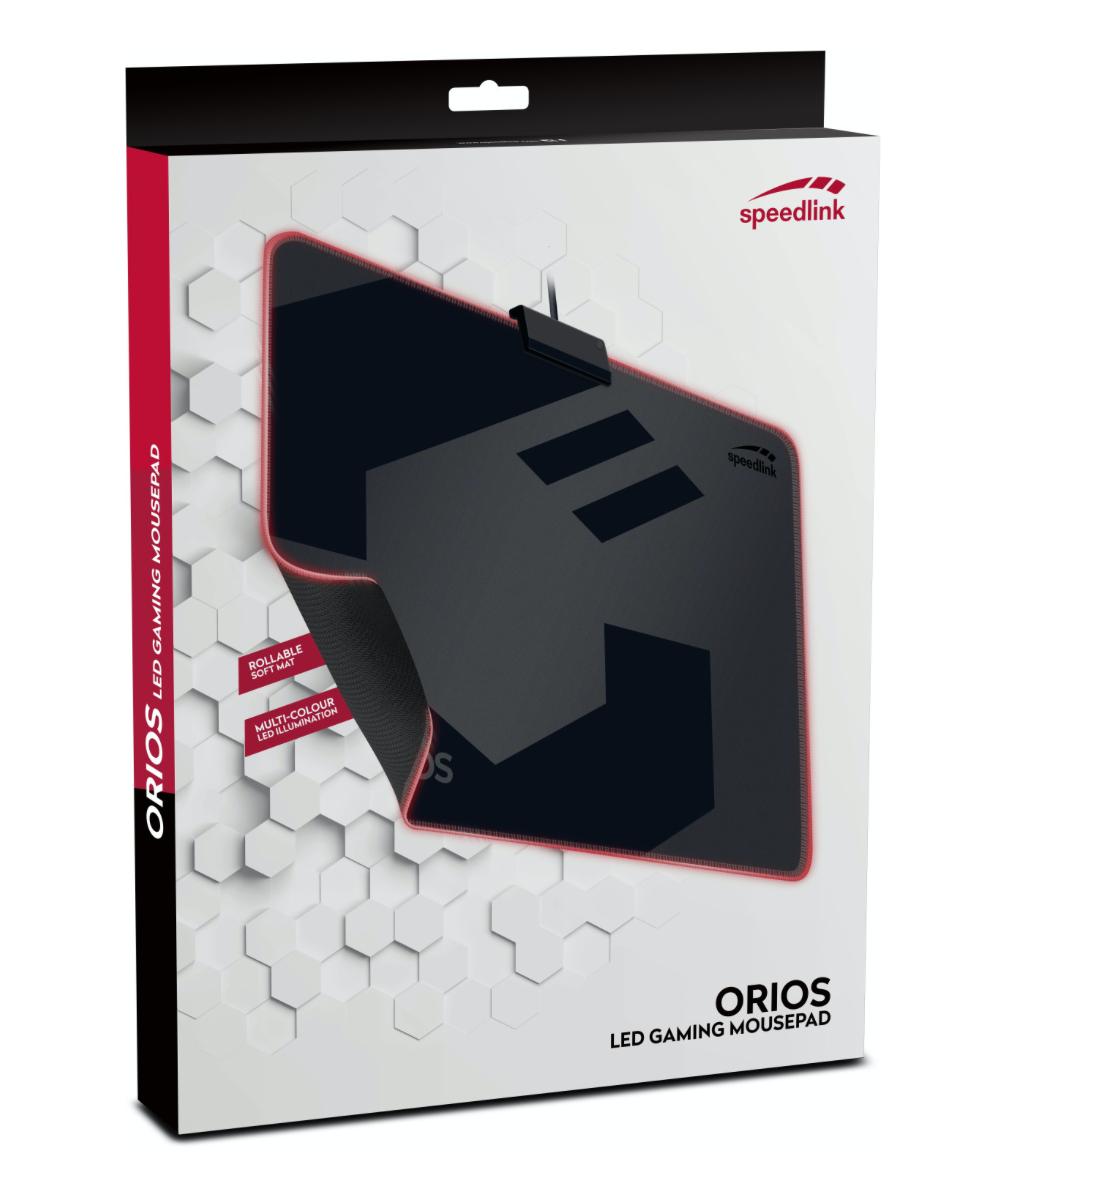 Speedlink Orios LED Gaming Mauspad ( RGB, USB, beleuchtet (B-Ware) )